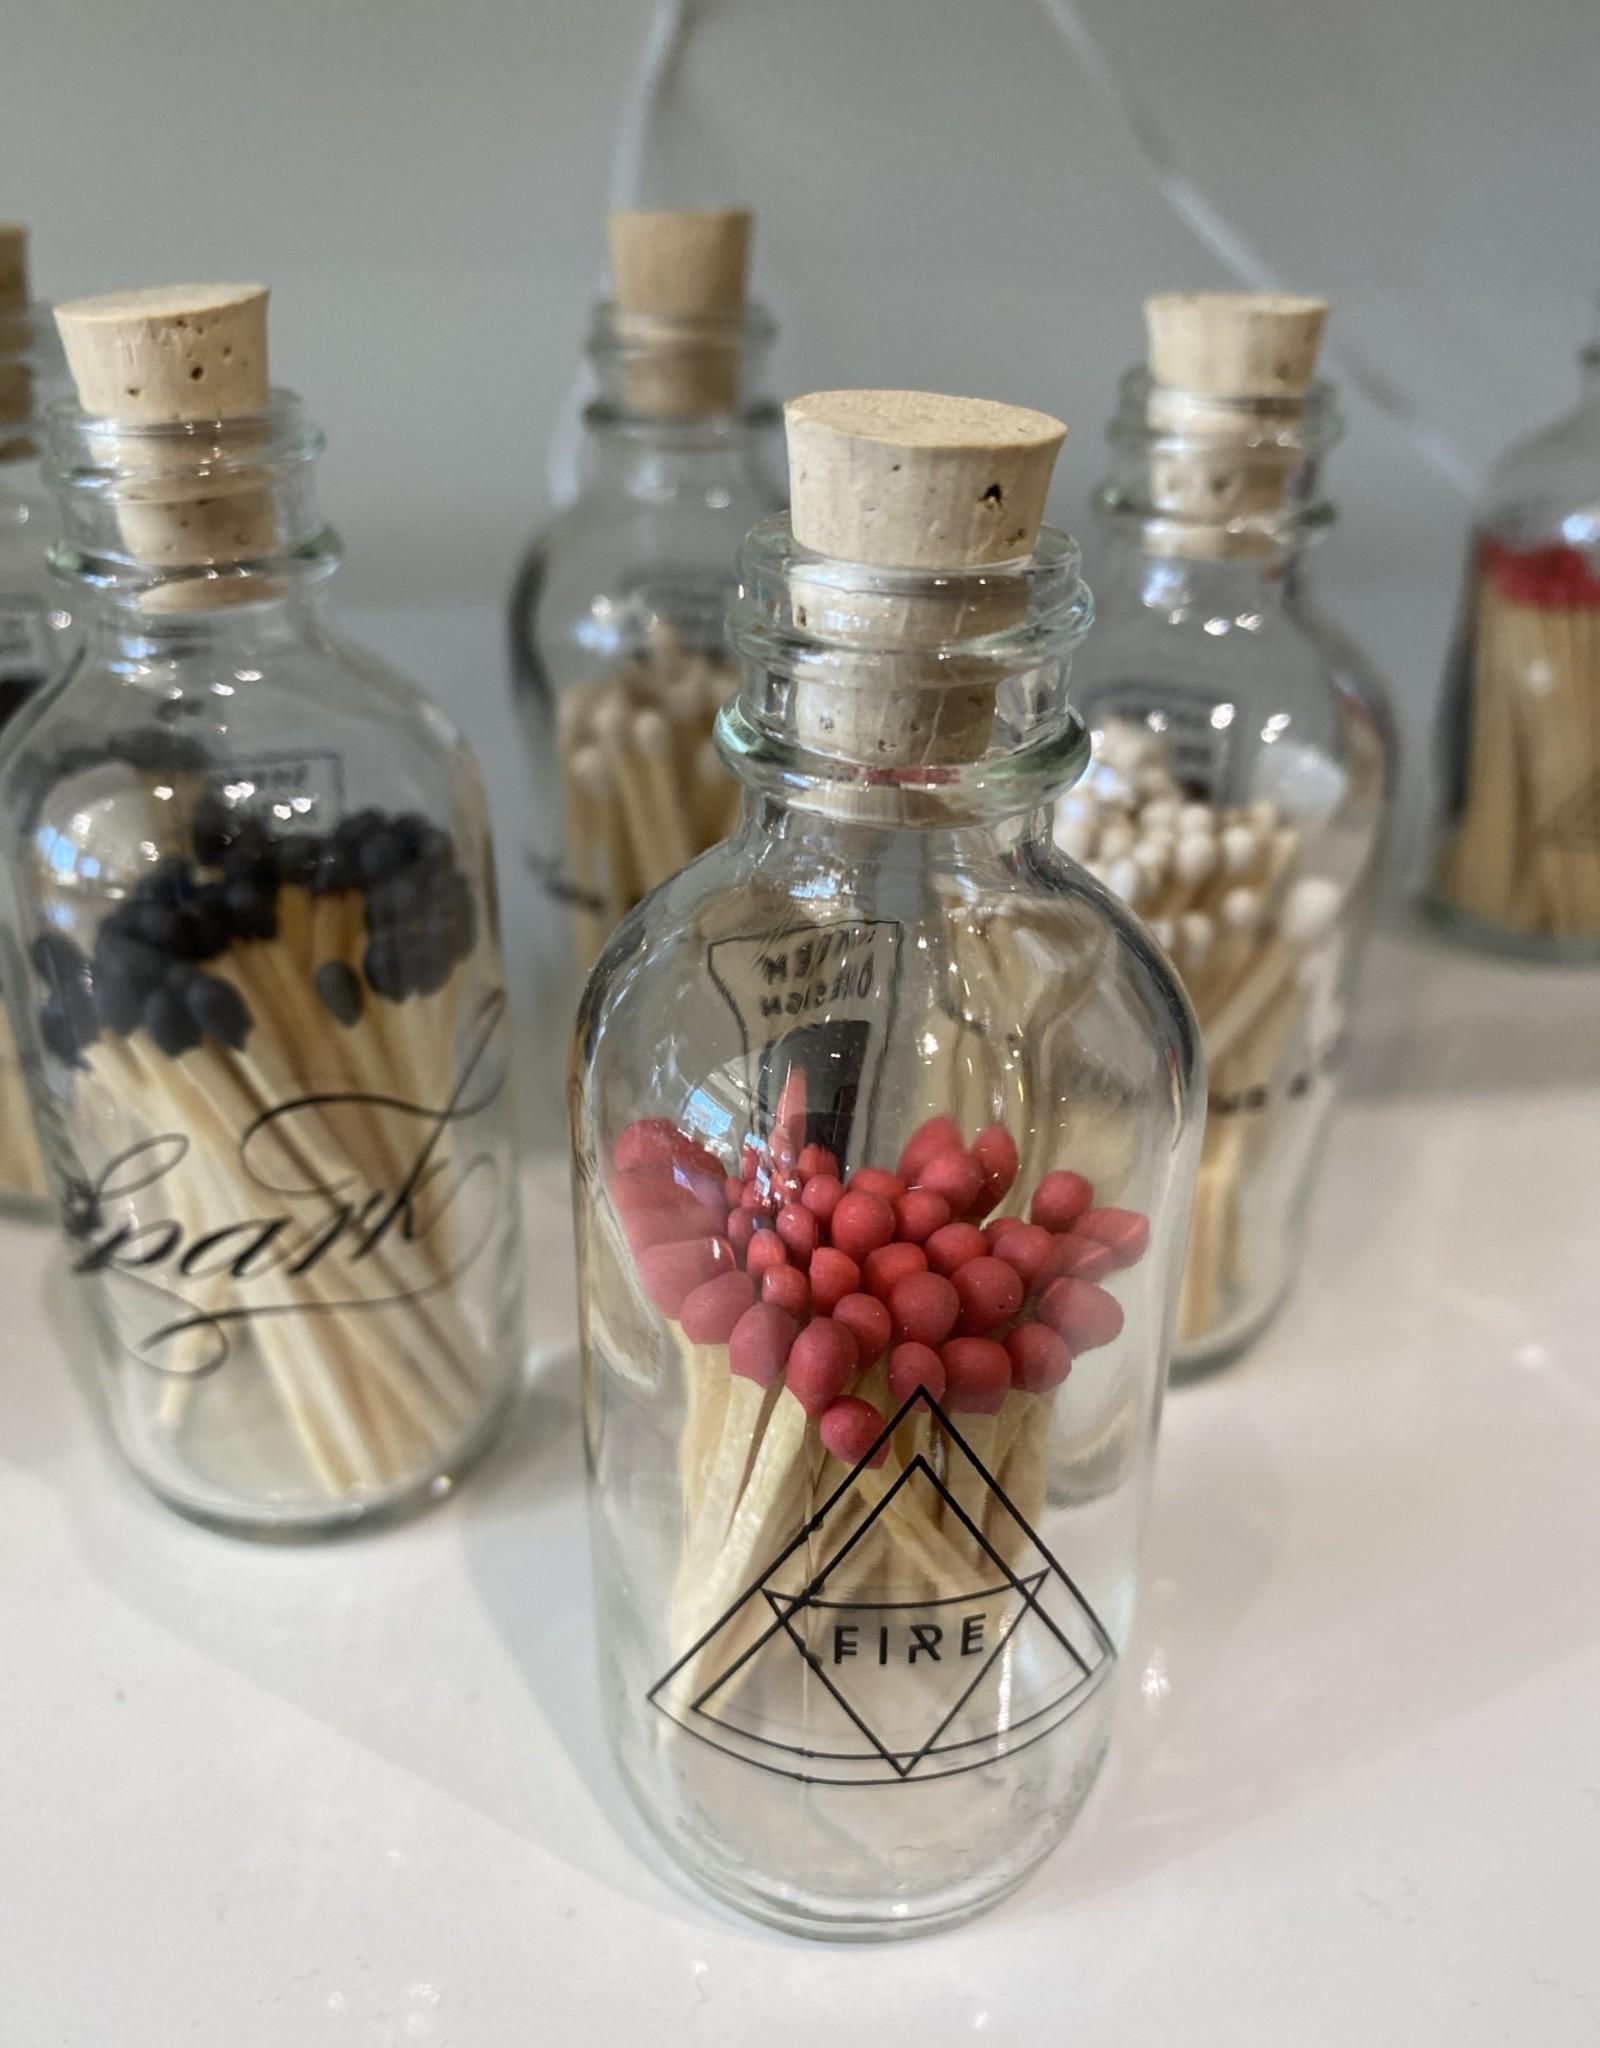 Skeem Mini Alchemy Bottle w/wooden matches